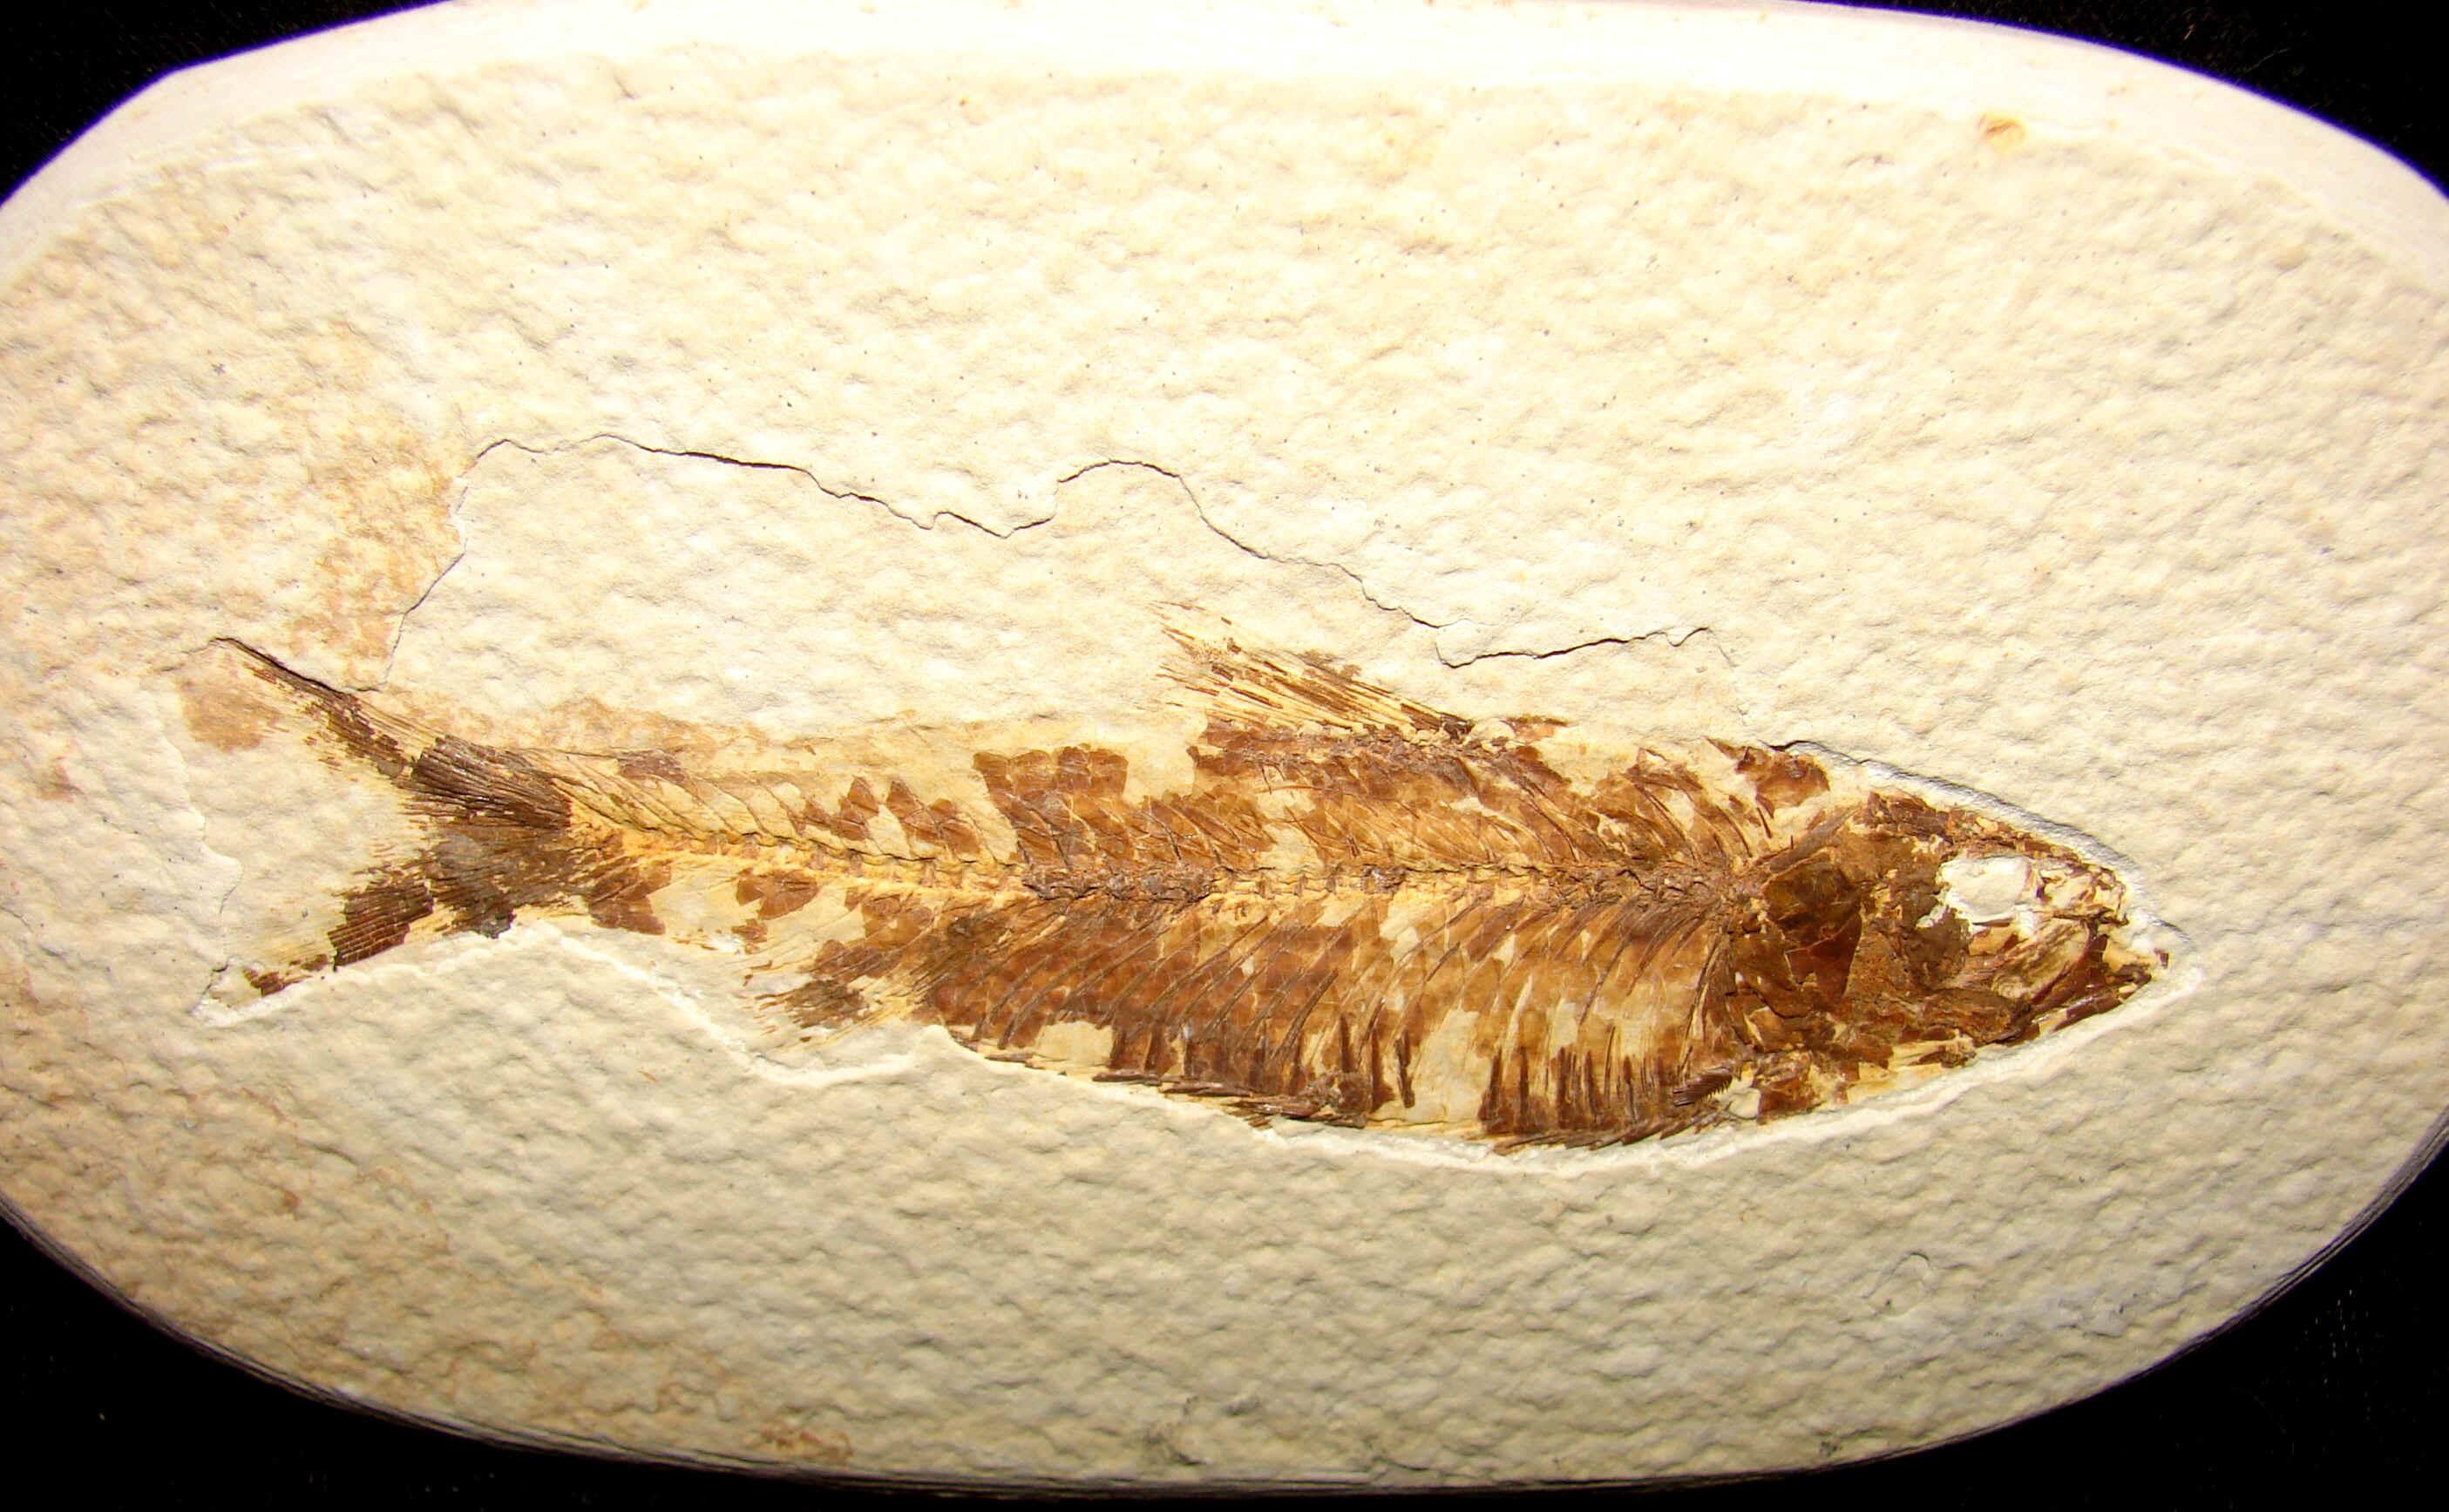 http://www.artfromgod.com/fossilfish-30.jpg (807370 bytes)